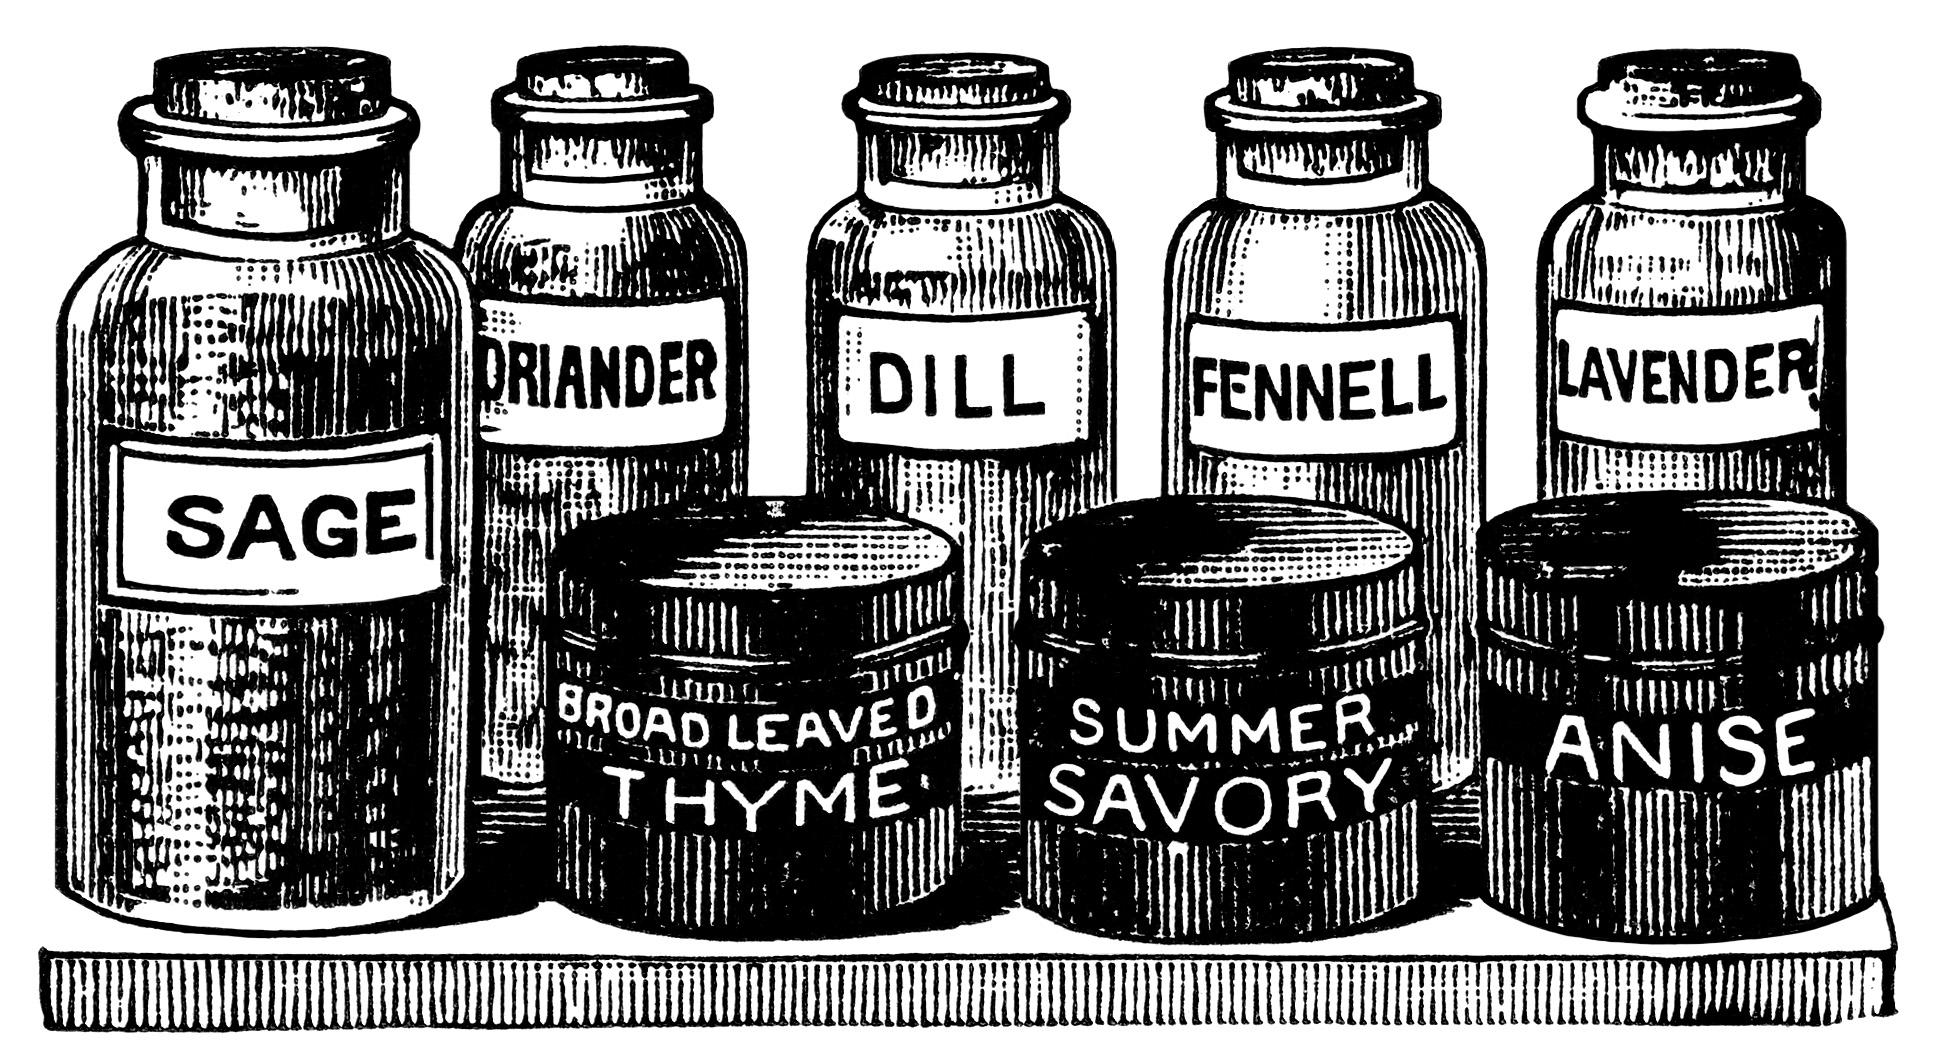 vintage herb clipart, black and white graphics, old advertising ephemera, vintage kitchen clip art, bottled herbs illustration